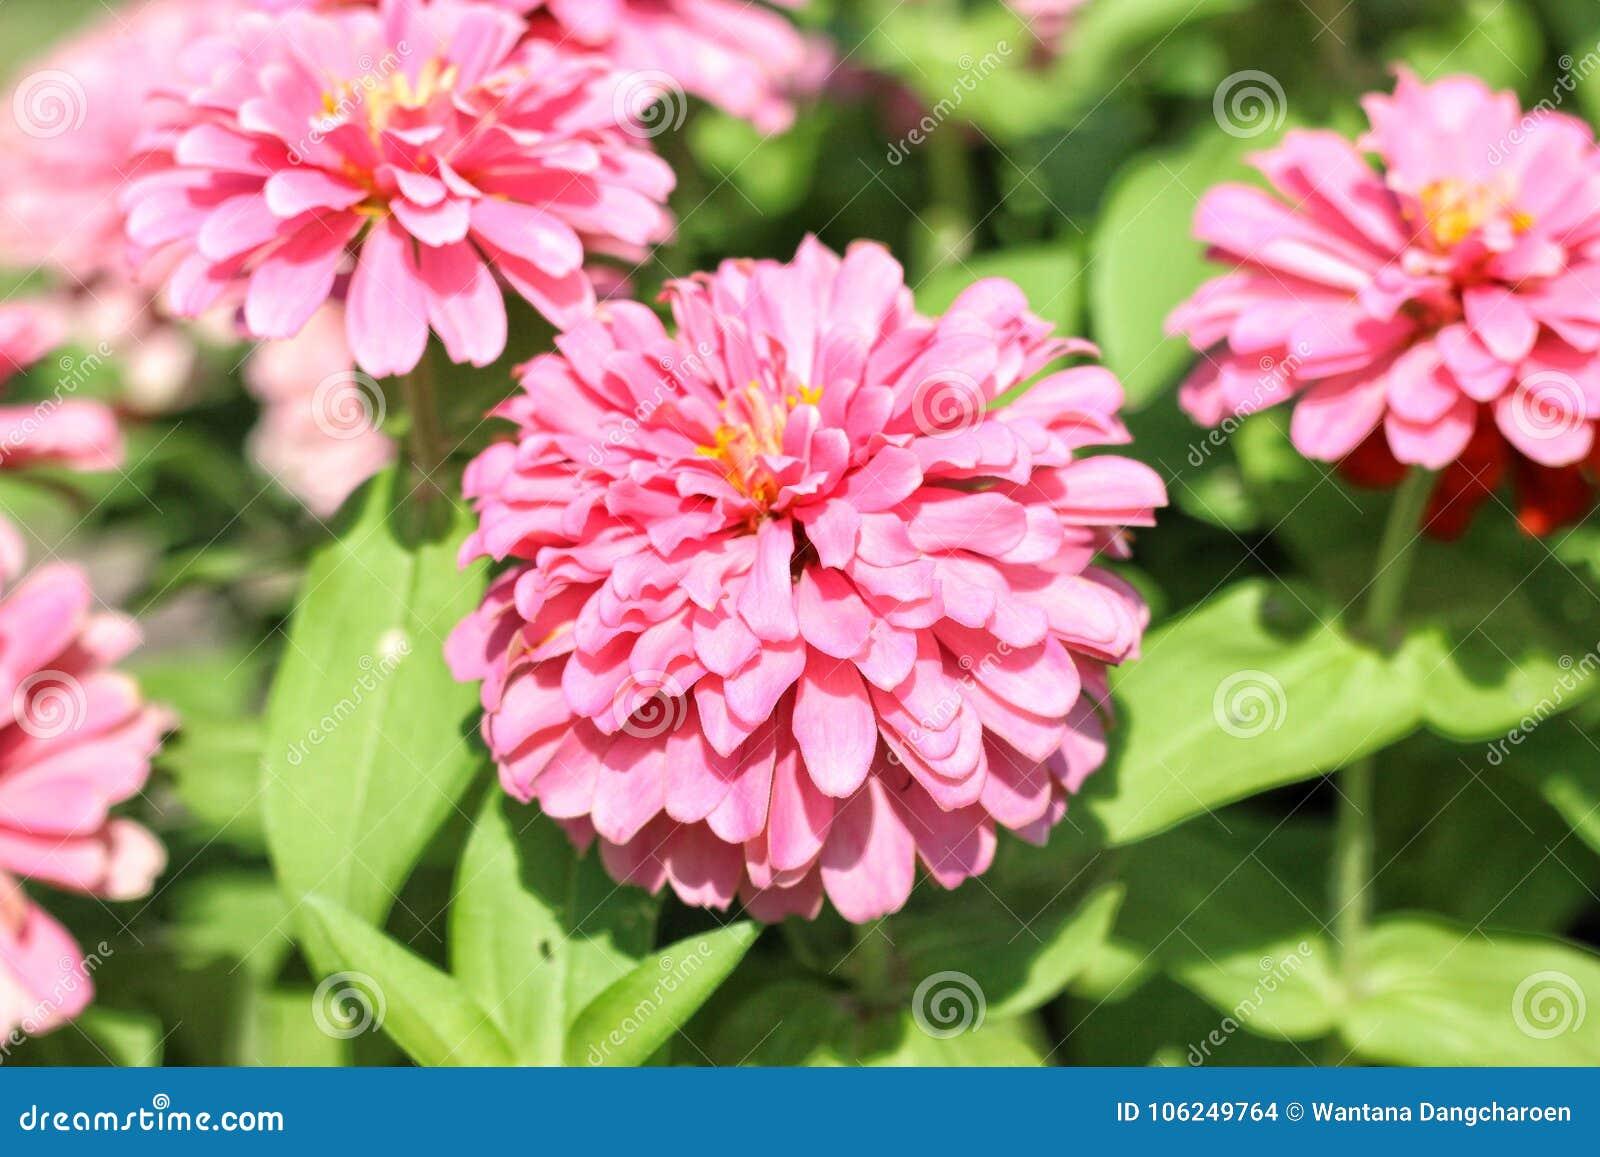 Zinnias roses dans le jardin